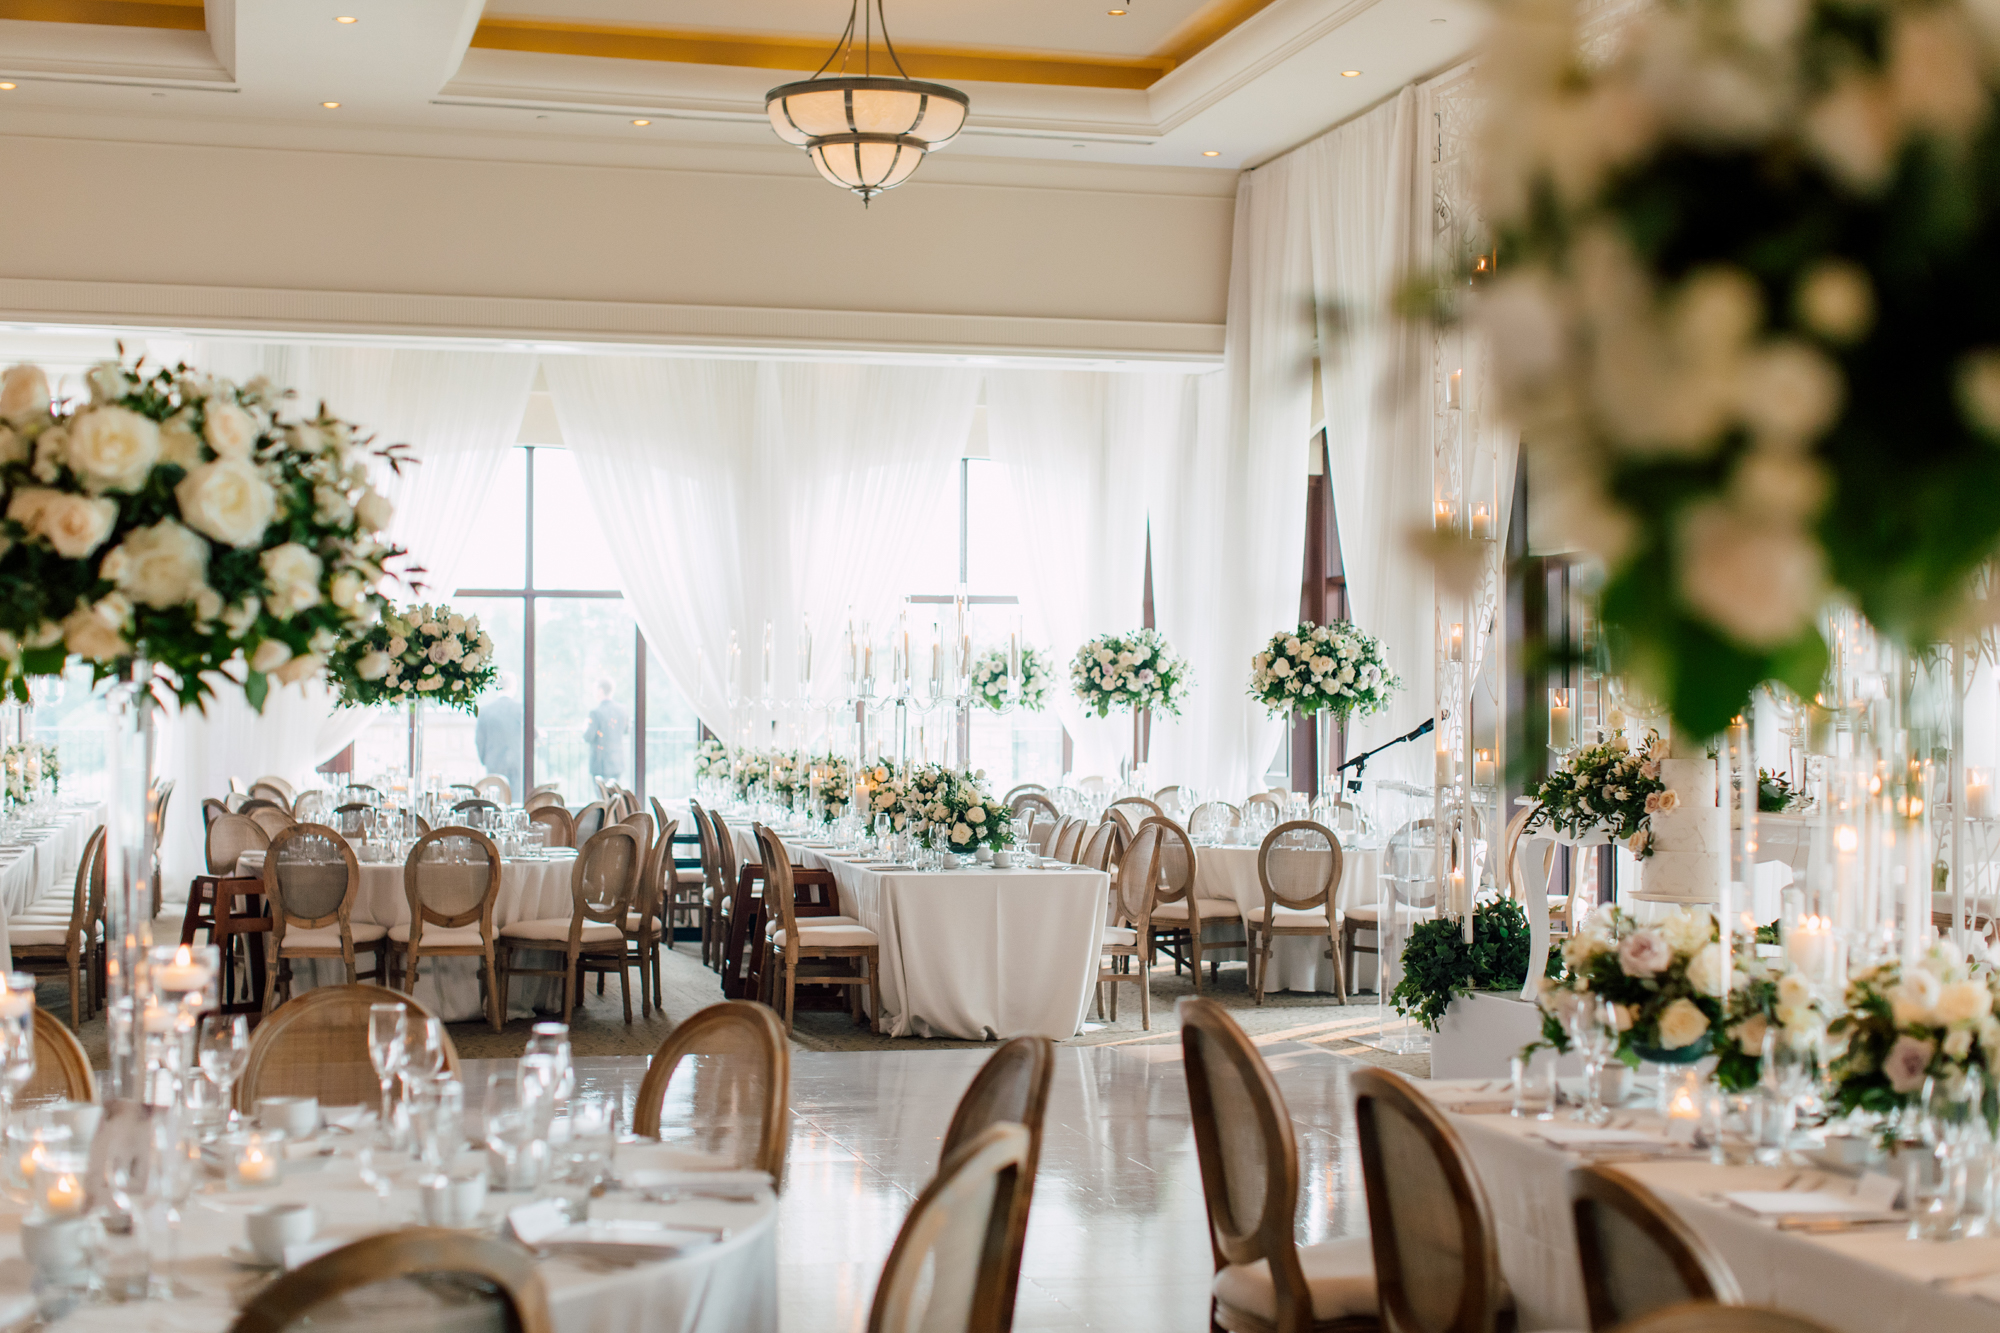 shealyn angus wedding design